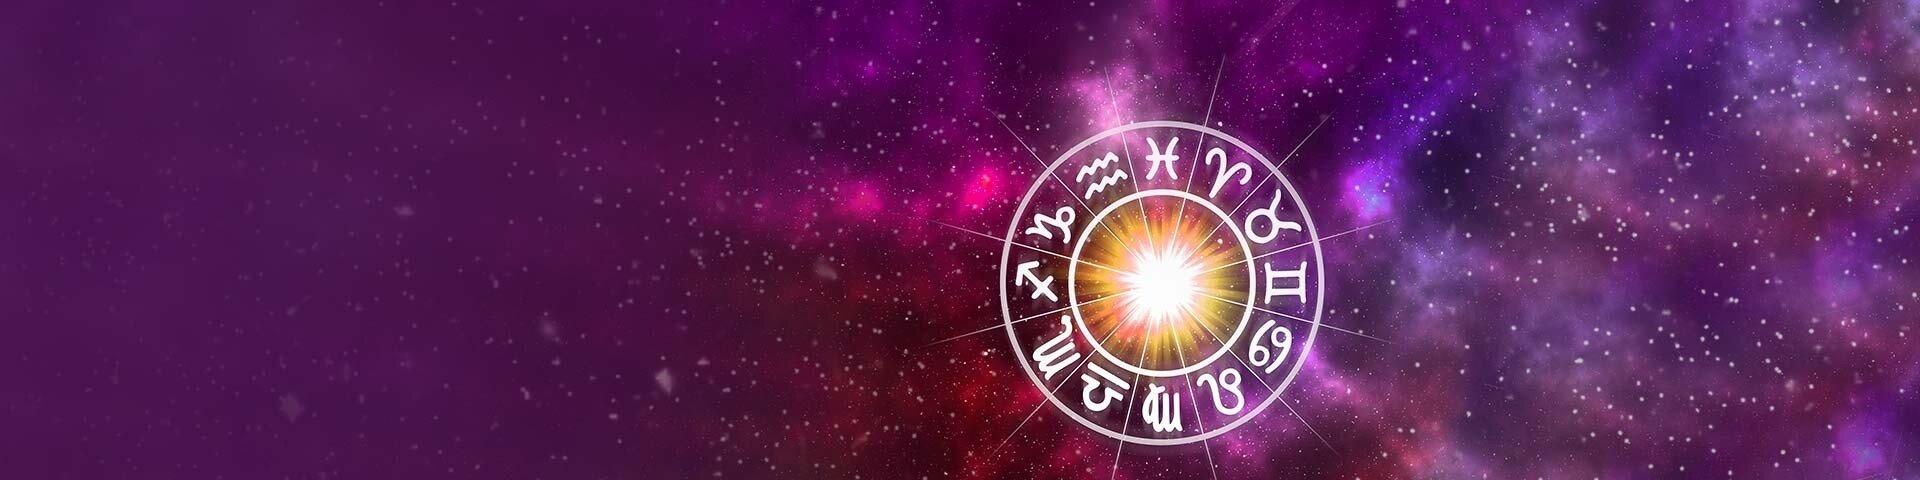 Aylık 1GB Astroloji Paketi